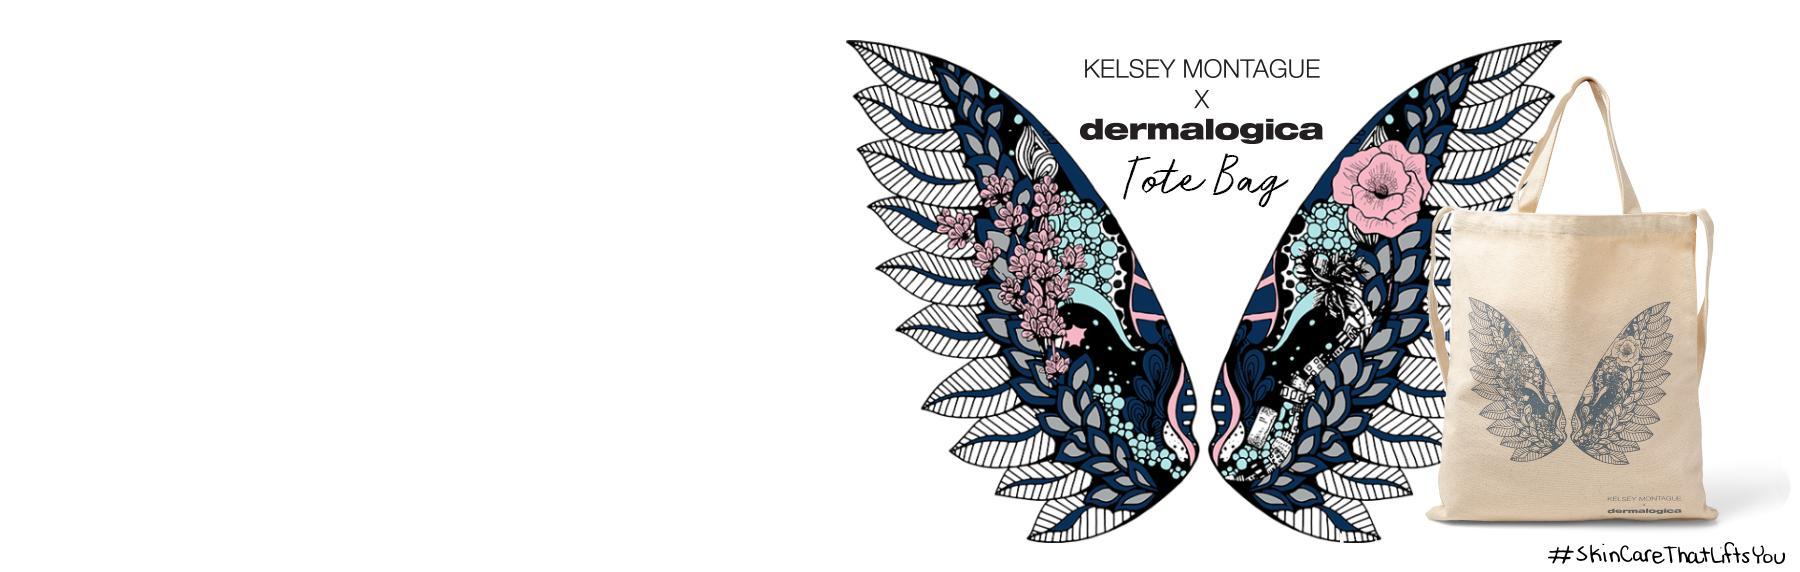 Kelsey Montague x Dermalogica - BENL